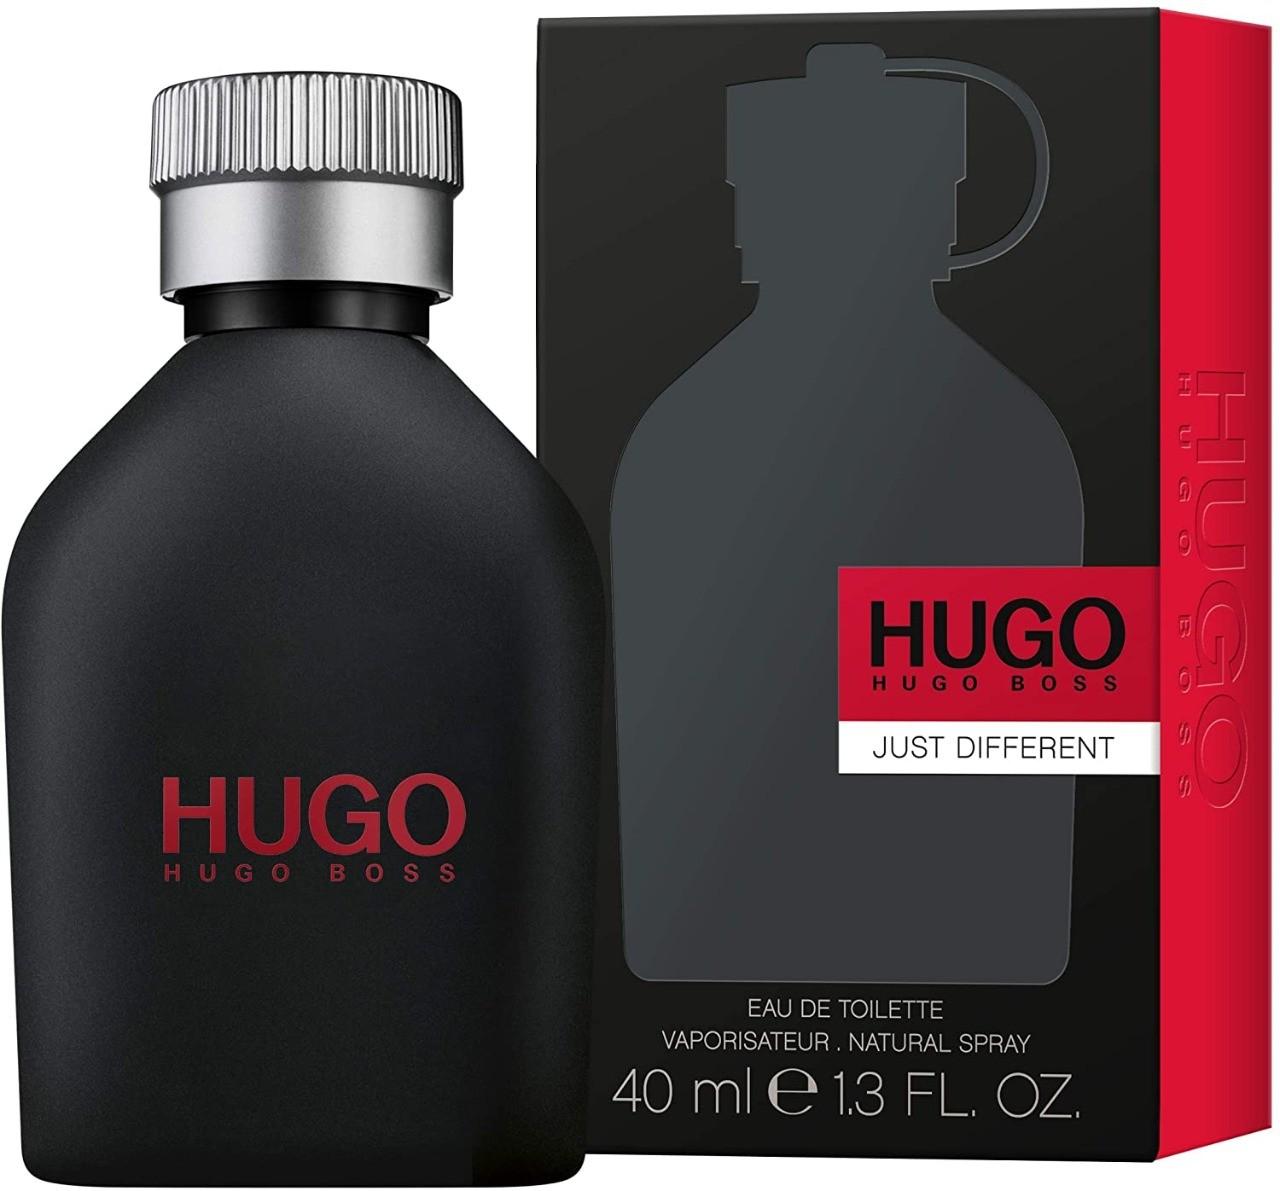 Just Different Hugo Boss Masculino Eau de Toilette 40ml